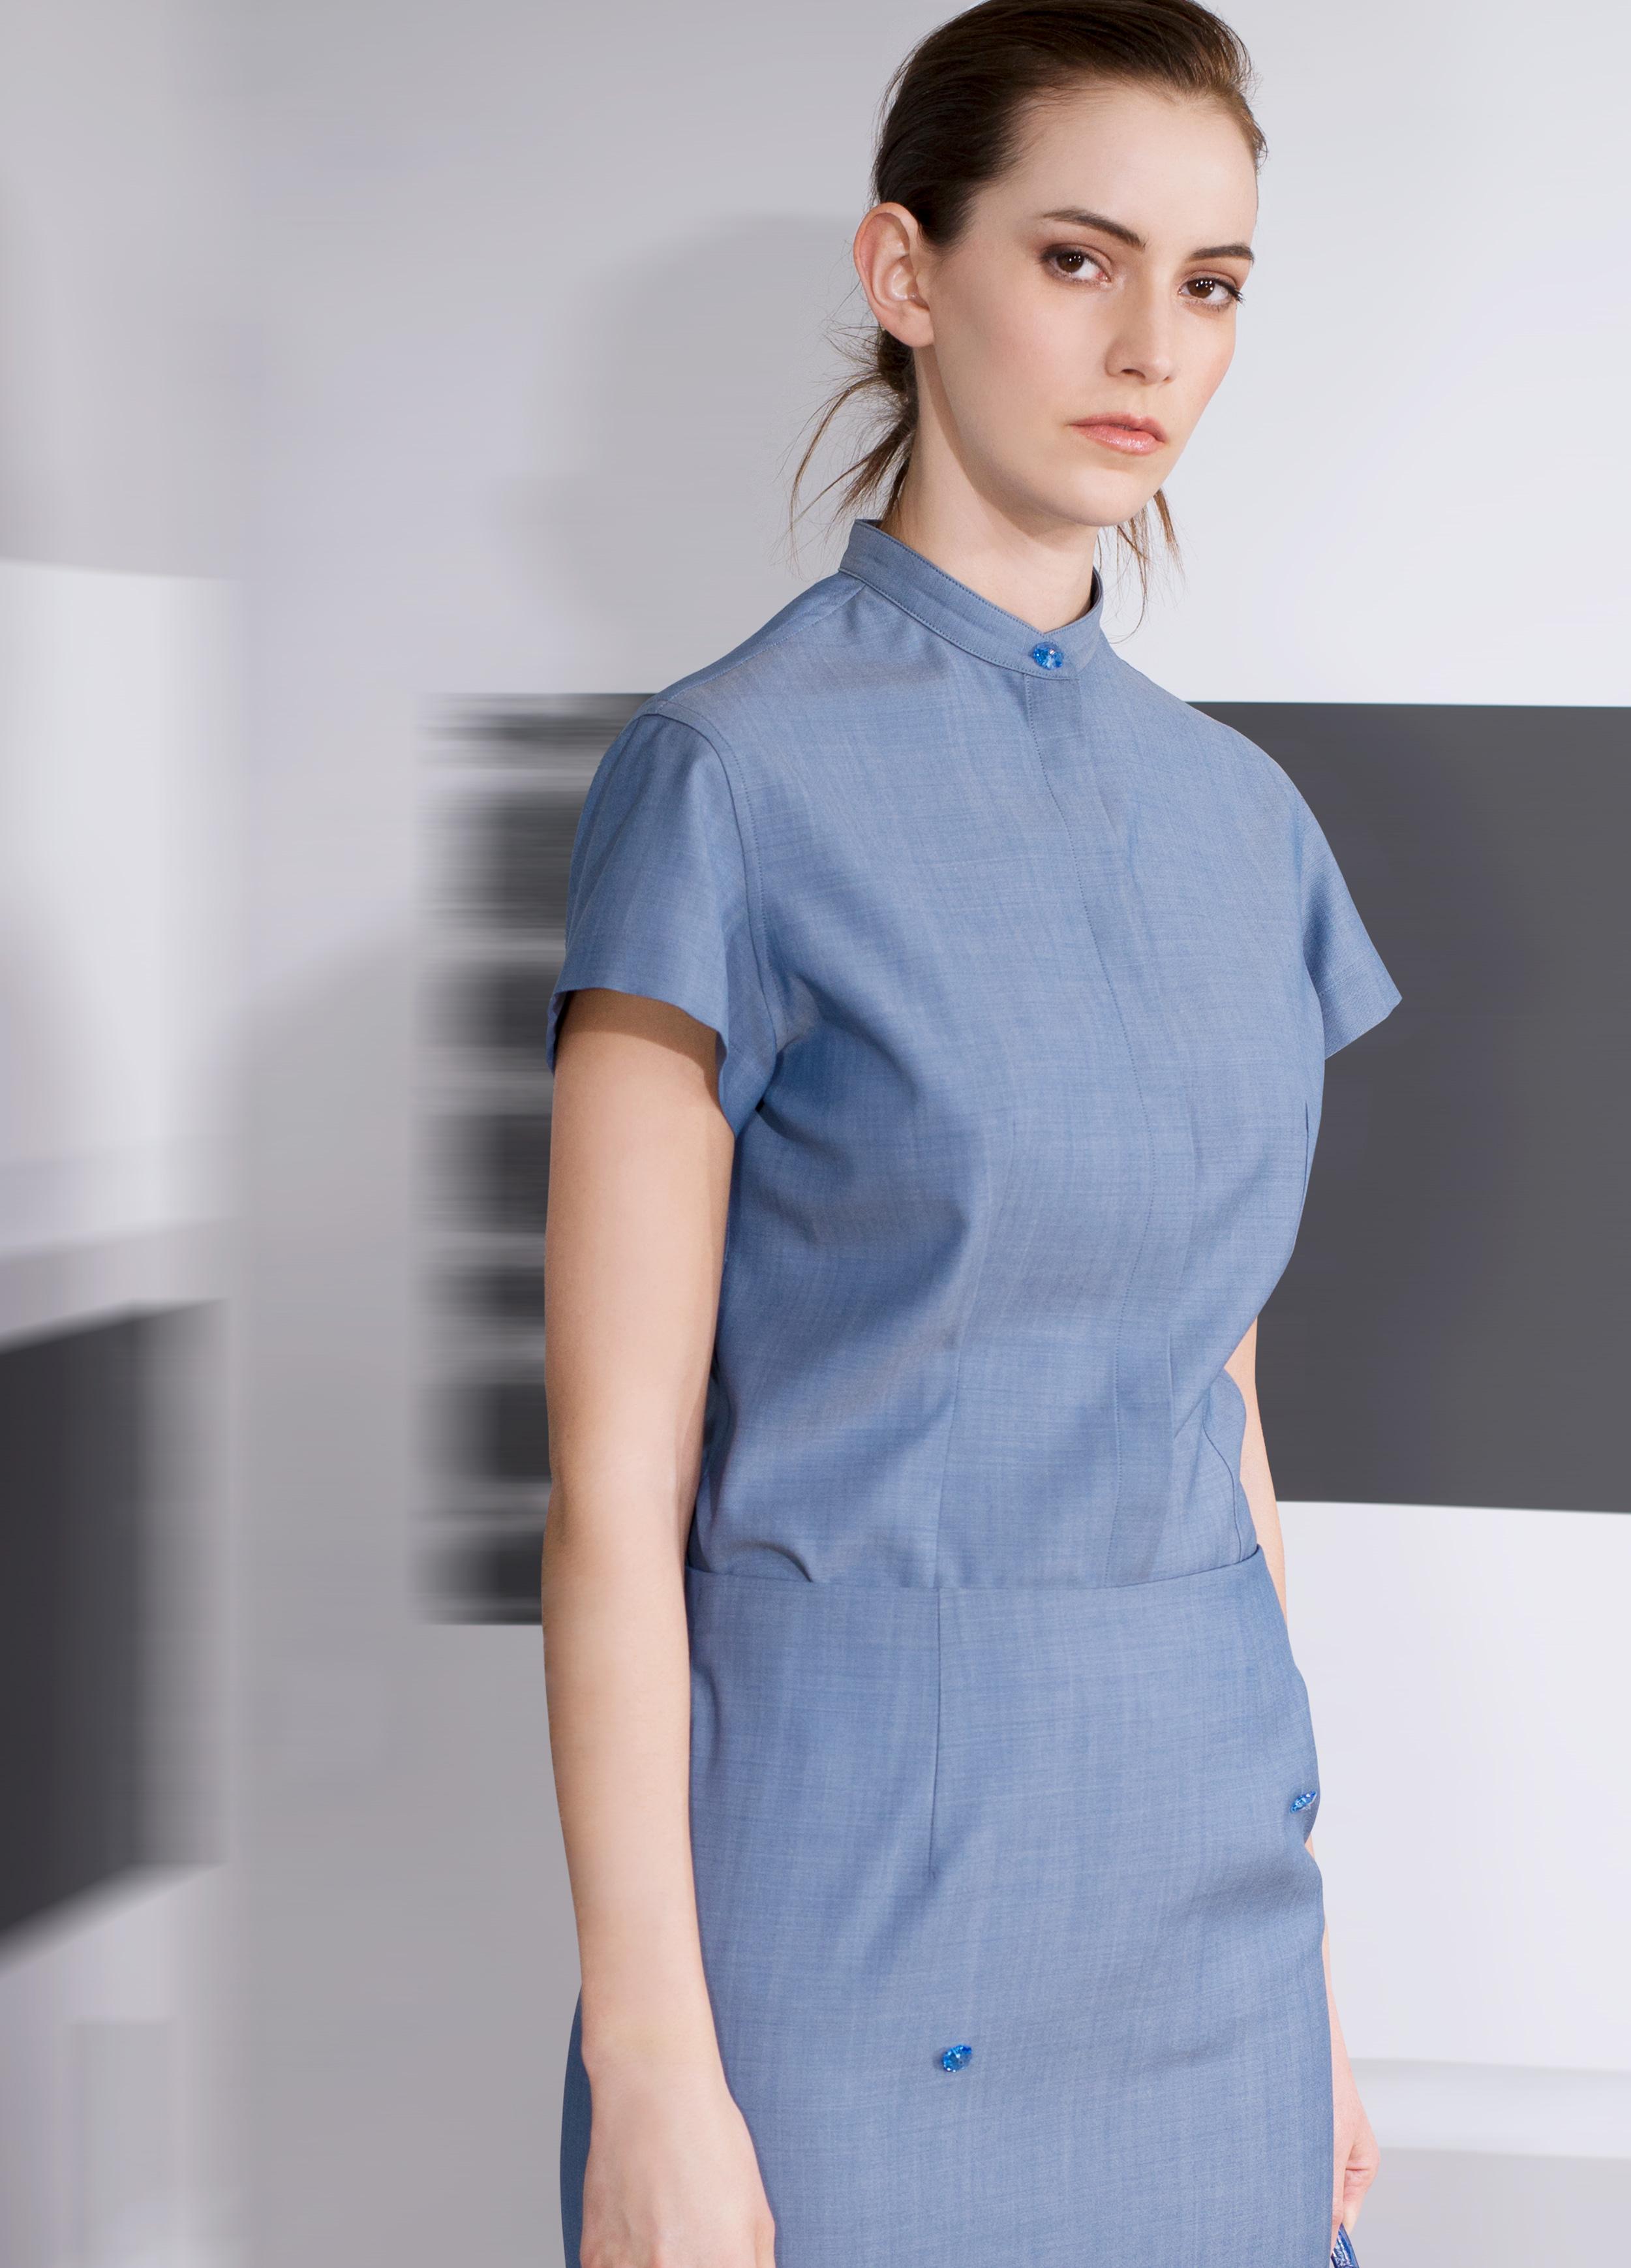 Superfine wool flower beaded mandarin collar top and skirt  sagestone plaster blue   Crocodile calf-skin top handle clutch bag